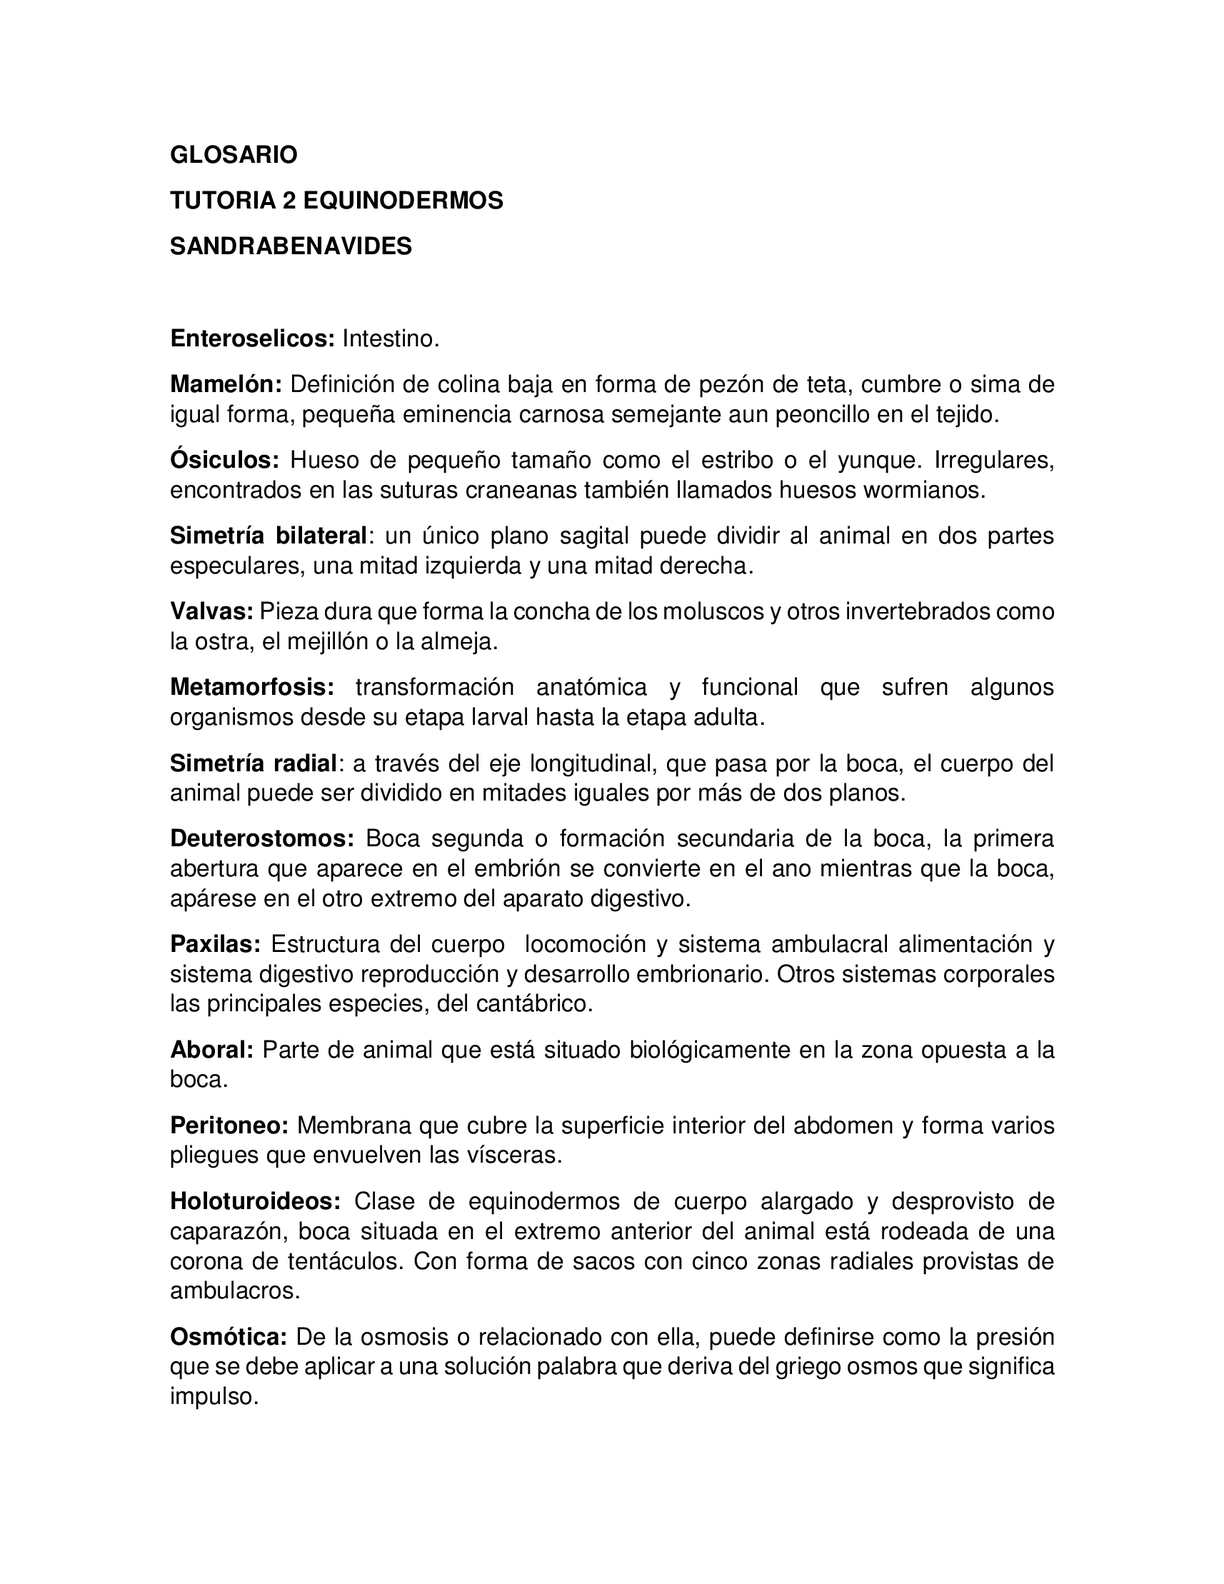 Calaméo Glosario Equinodermos